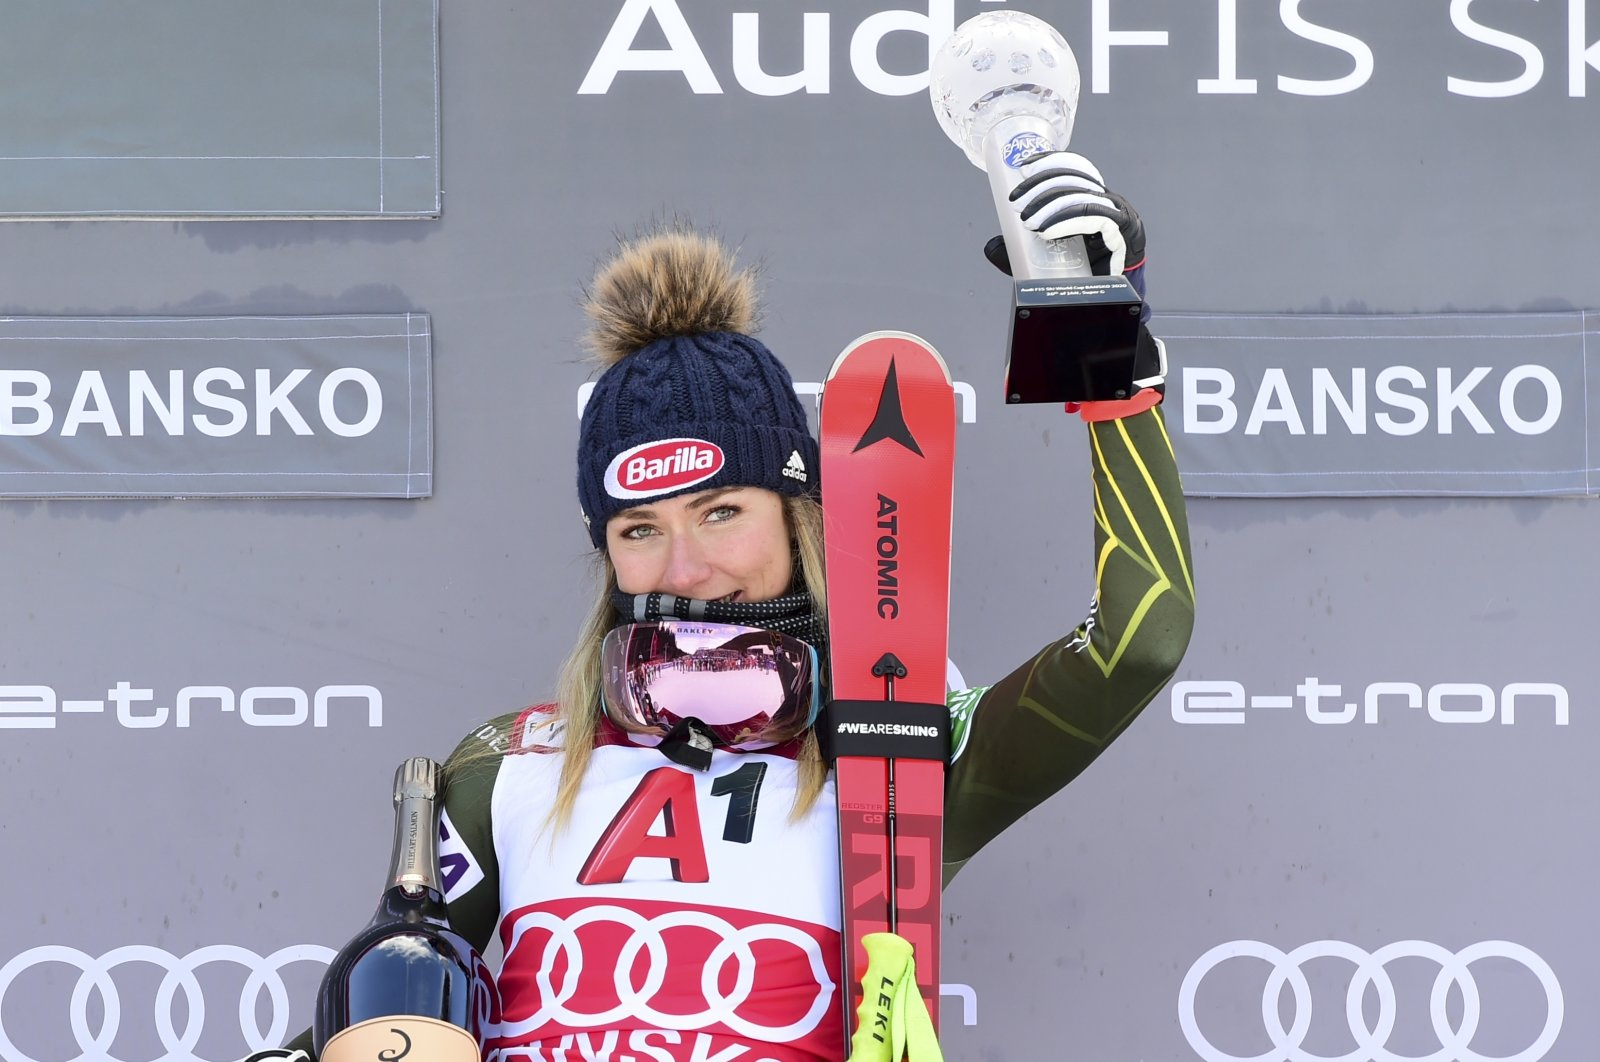 Mikaela Shiffrin celebrates after winning the women's World Cup super-G, in Bansko, Bulgaria, Jan. 26, 2020. (AP Photo)